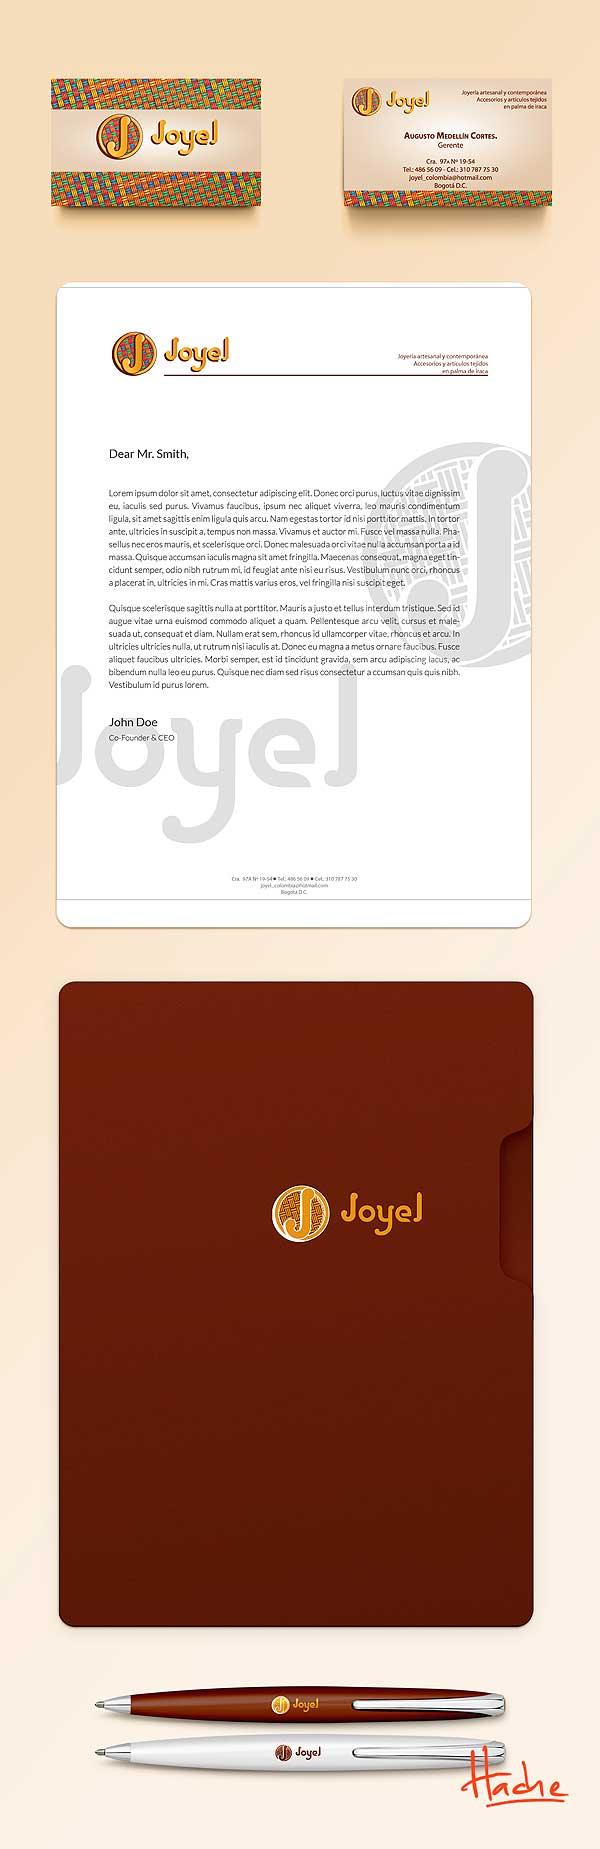 Imagen corporativa. Joyel Joyería por Hache Holguín